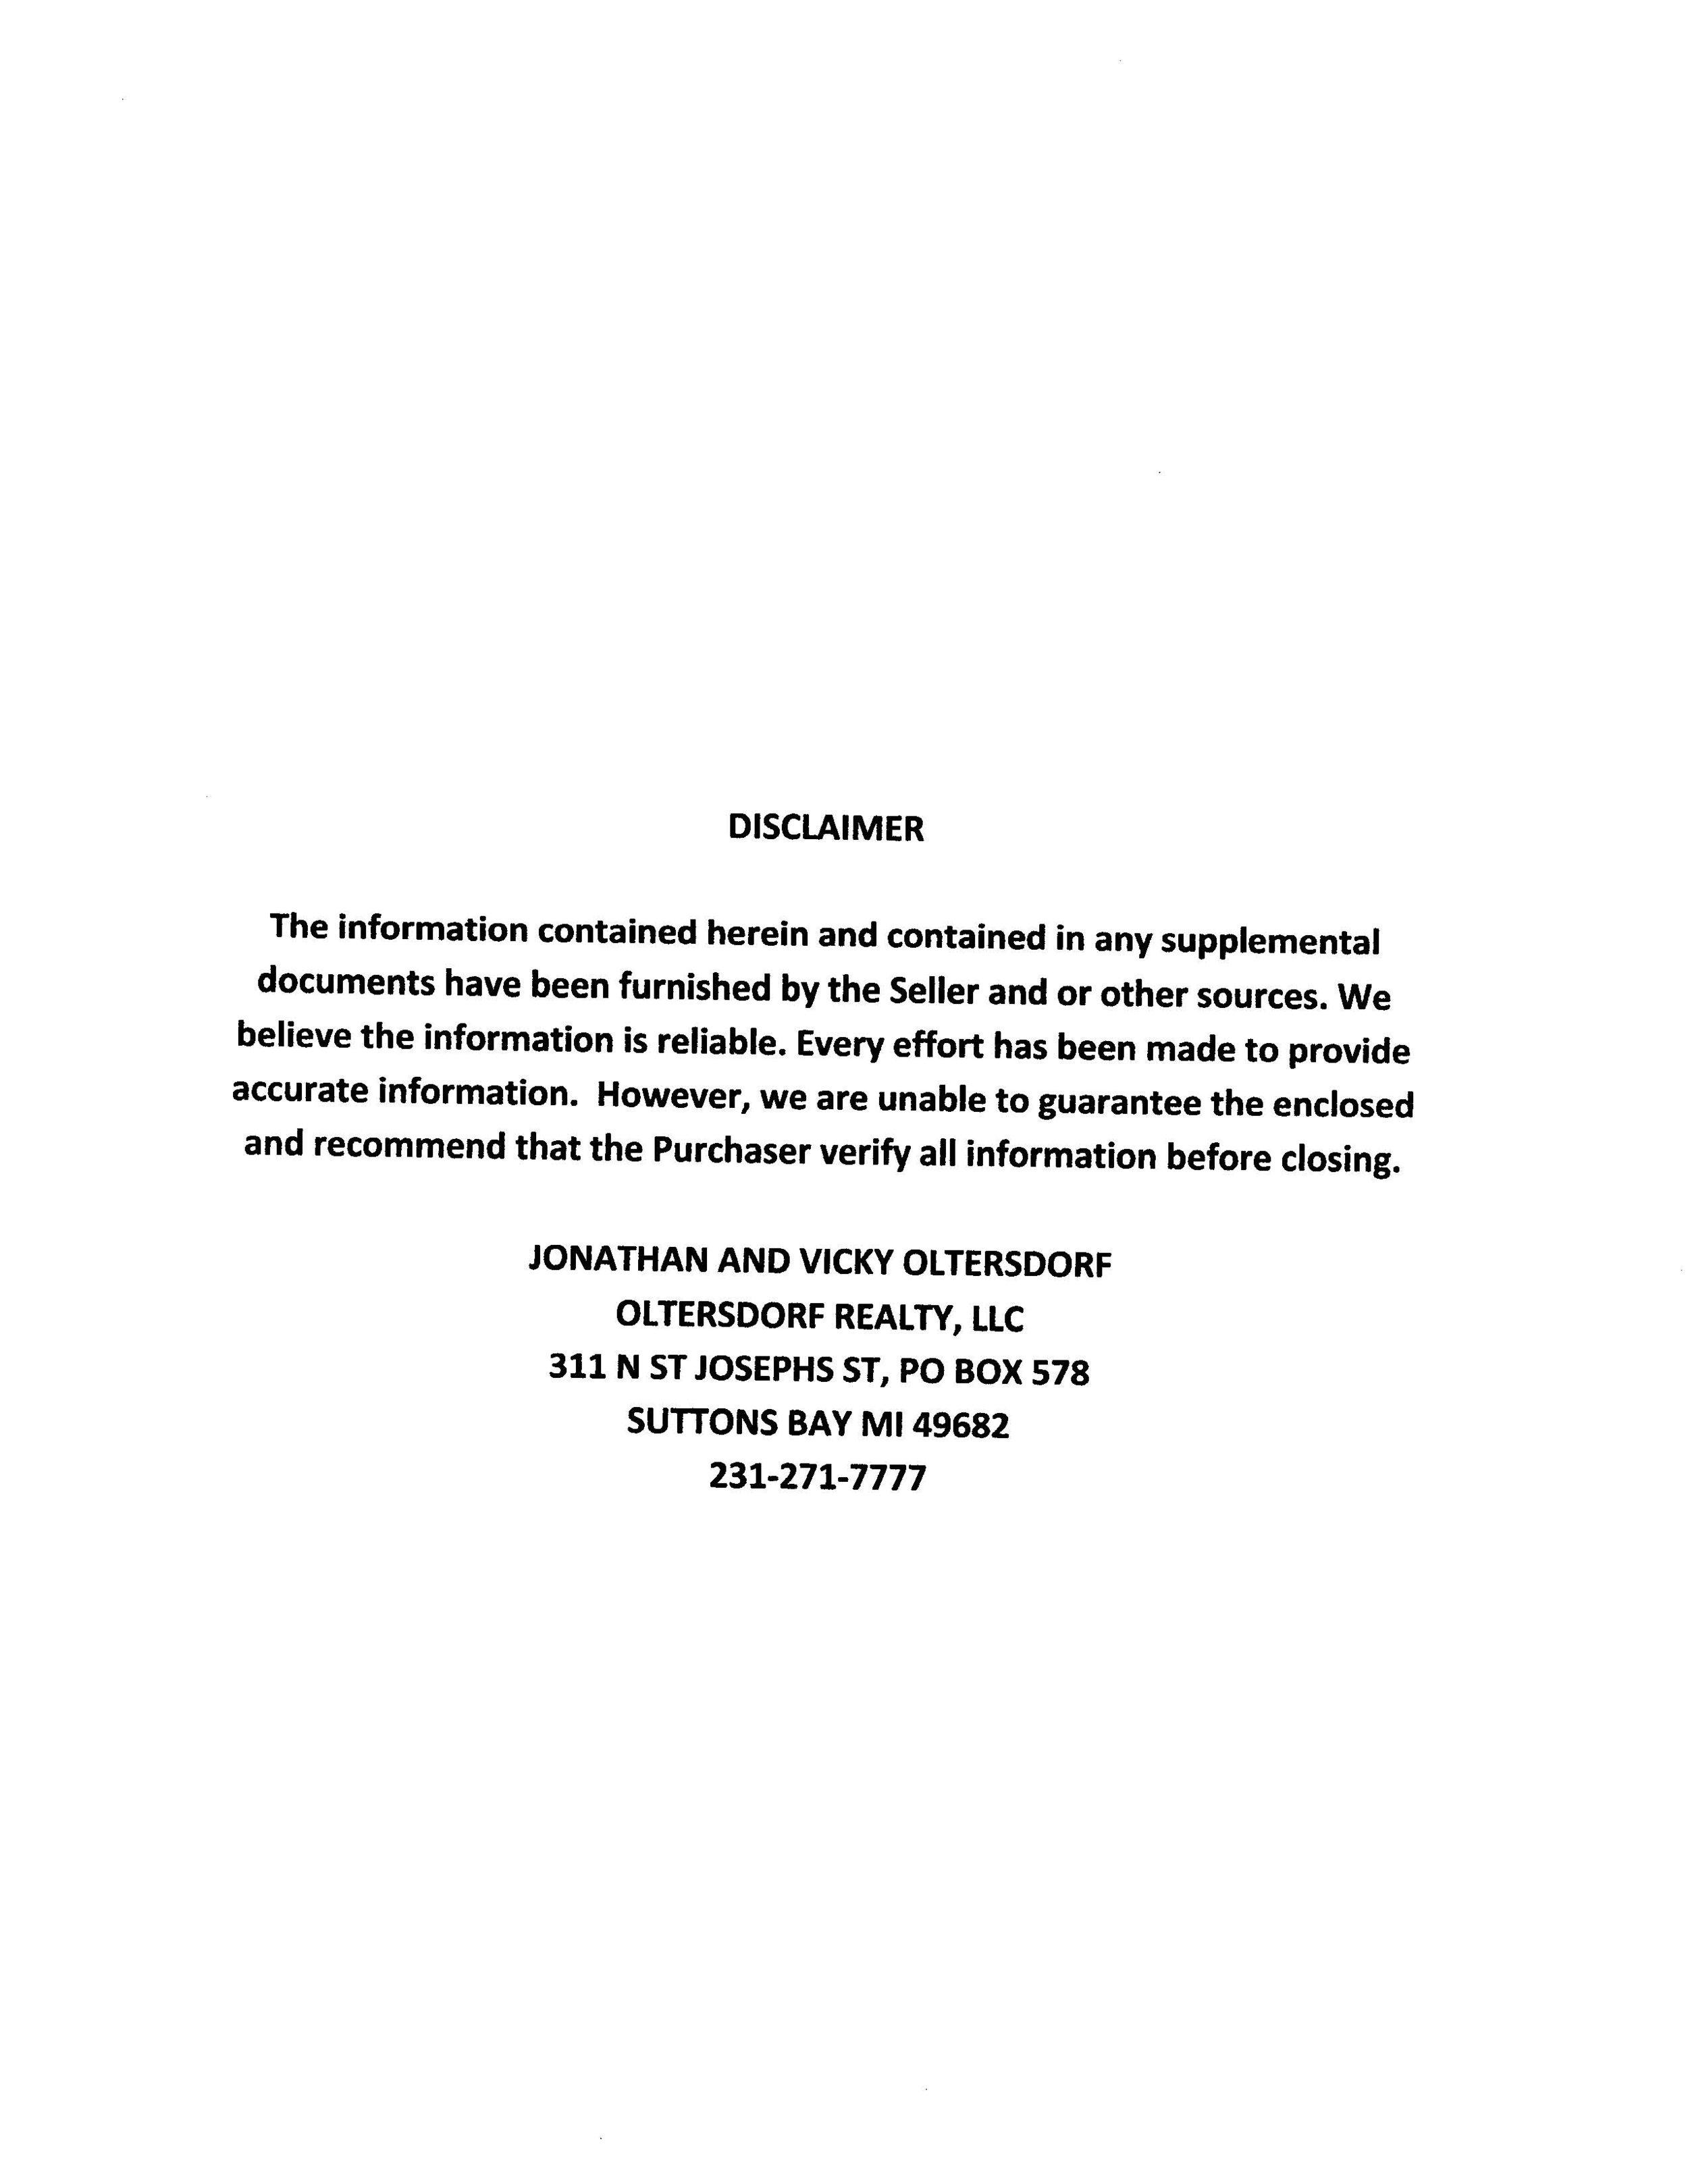 4037 E Yule Tree Lane, Lake Leelanau – FOR SALE by Oltersdorf Realty LLC - Marketing Packet (34).jpg